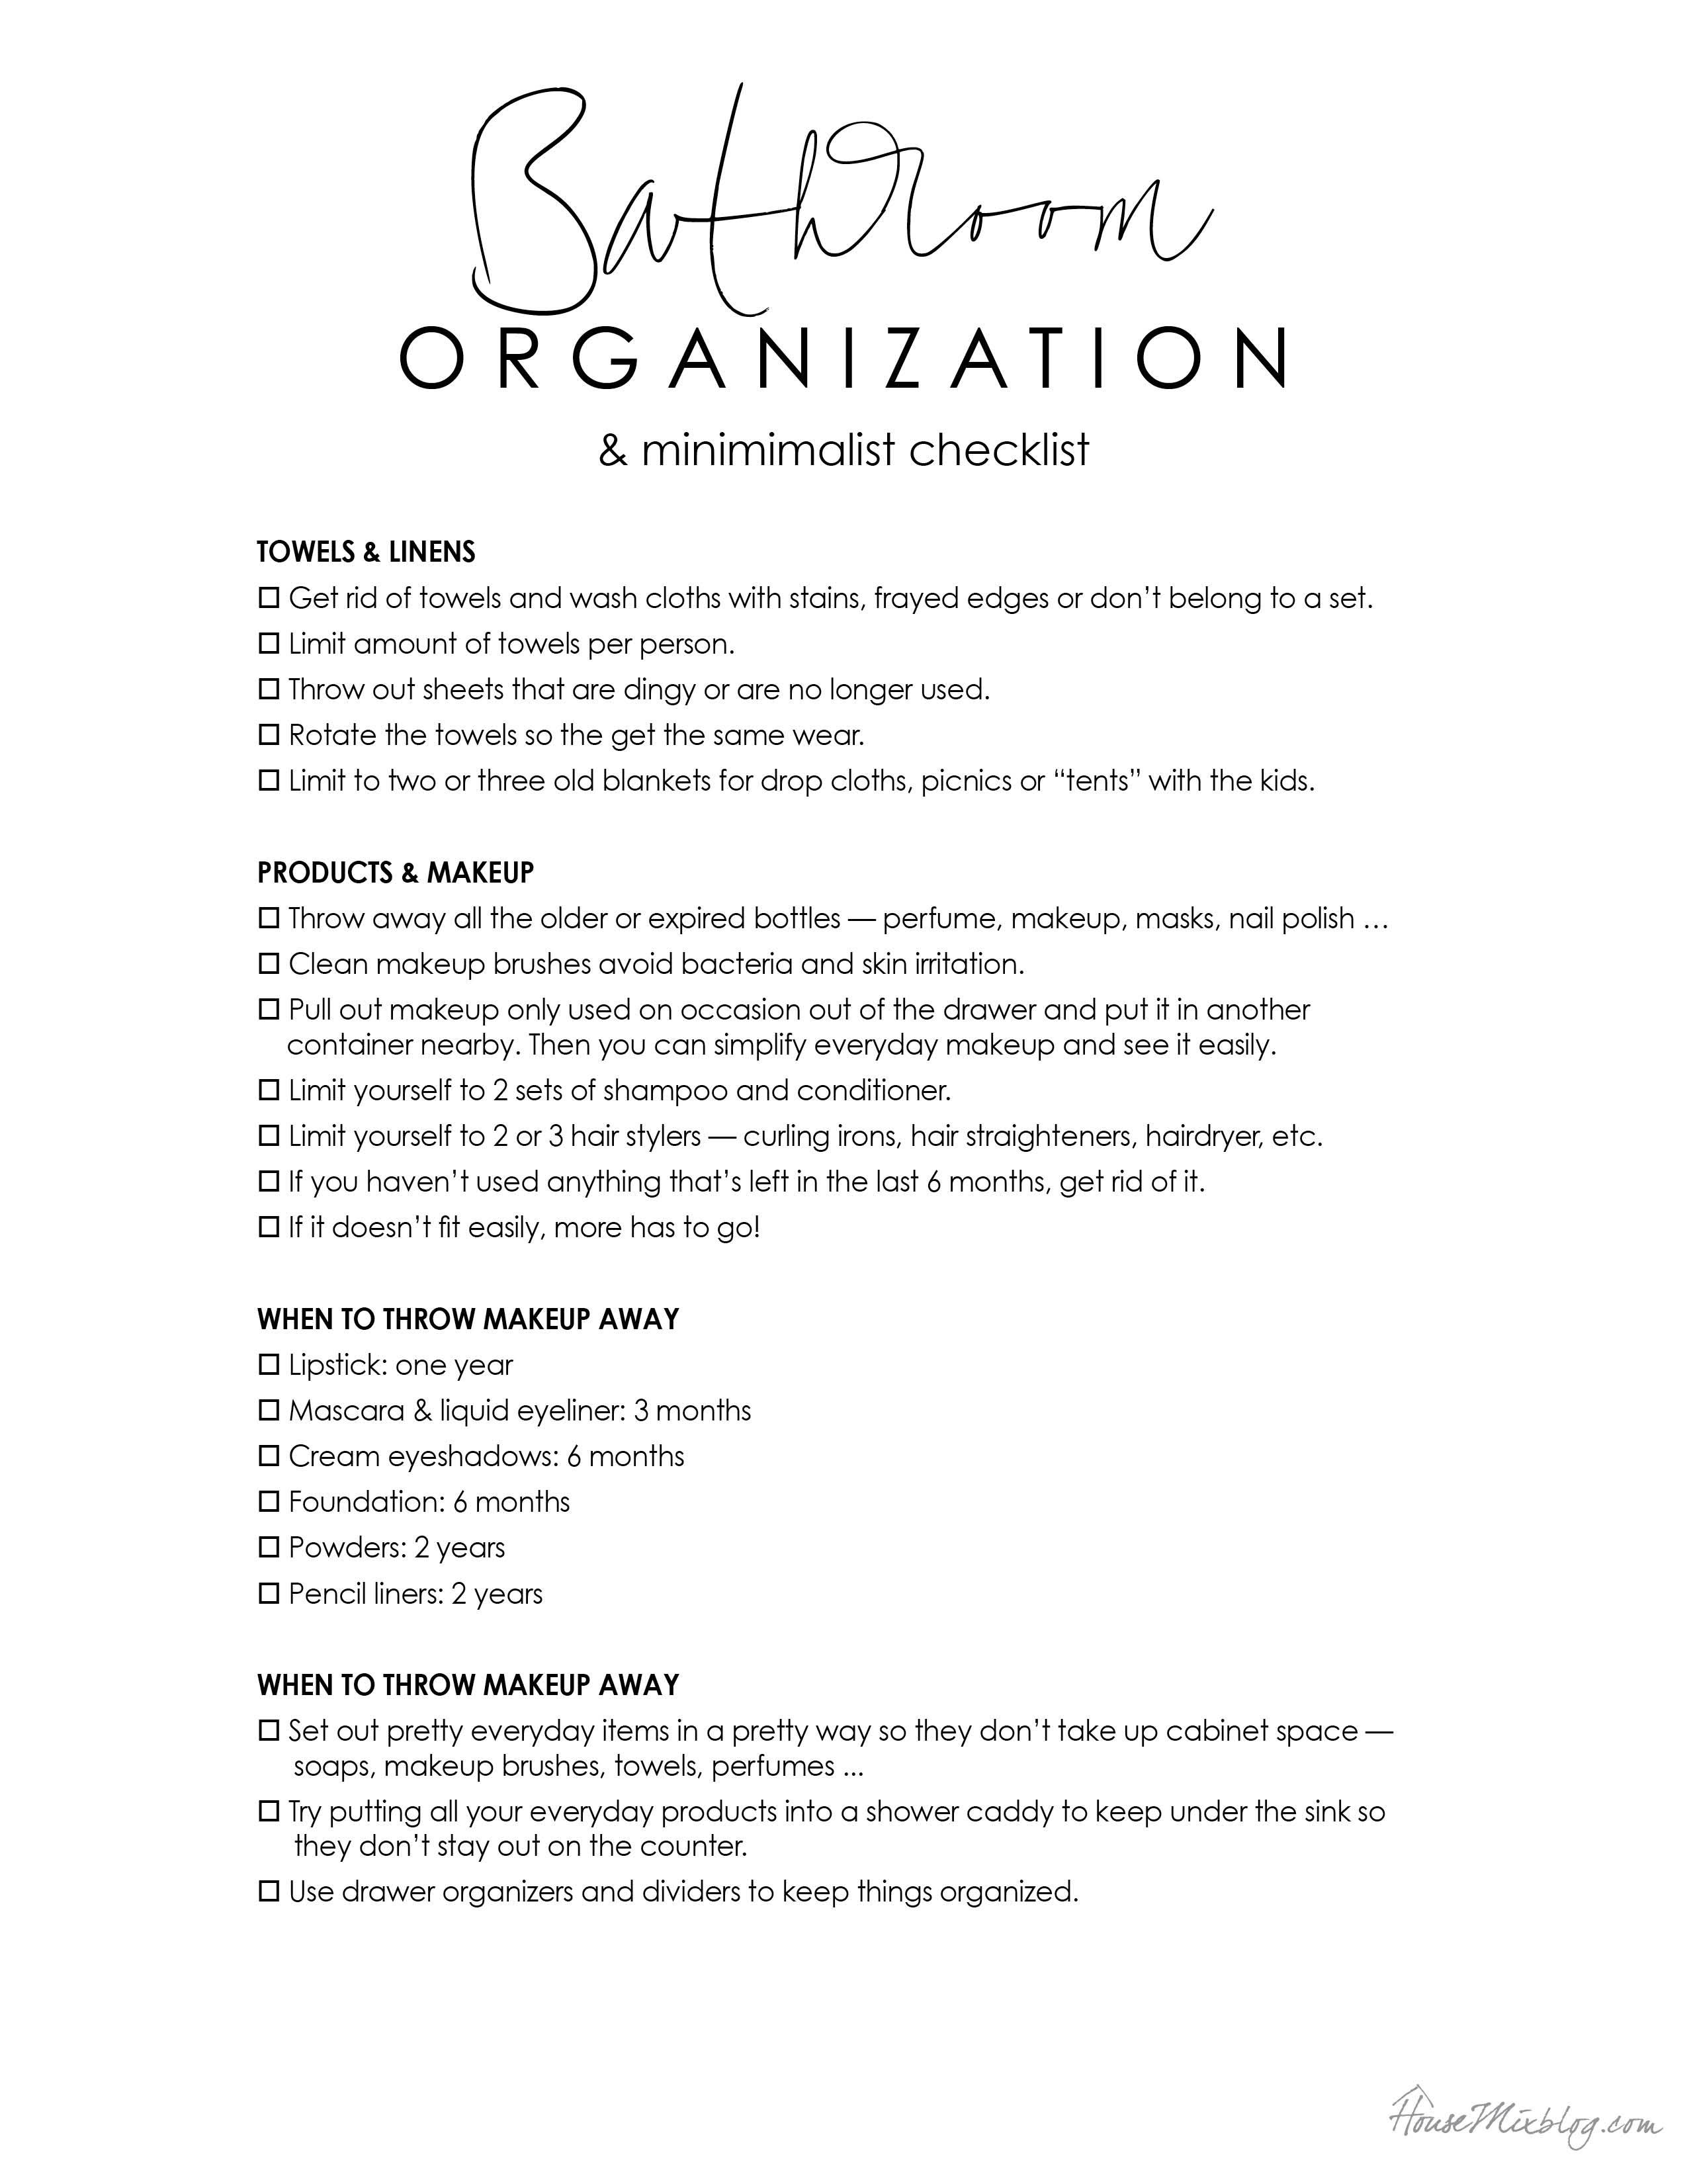 Bathroom Organization Ideas And Minimalist Checklist House Mix